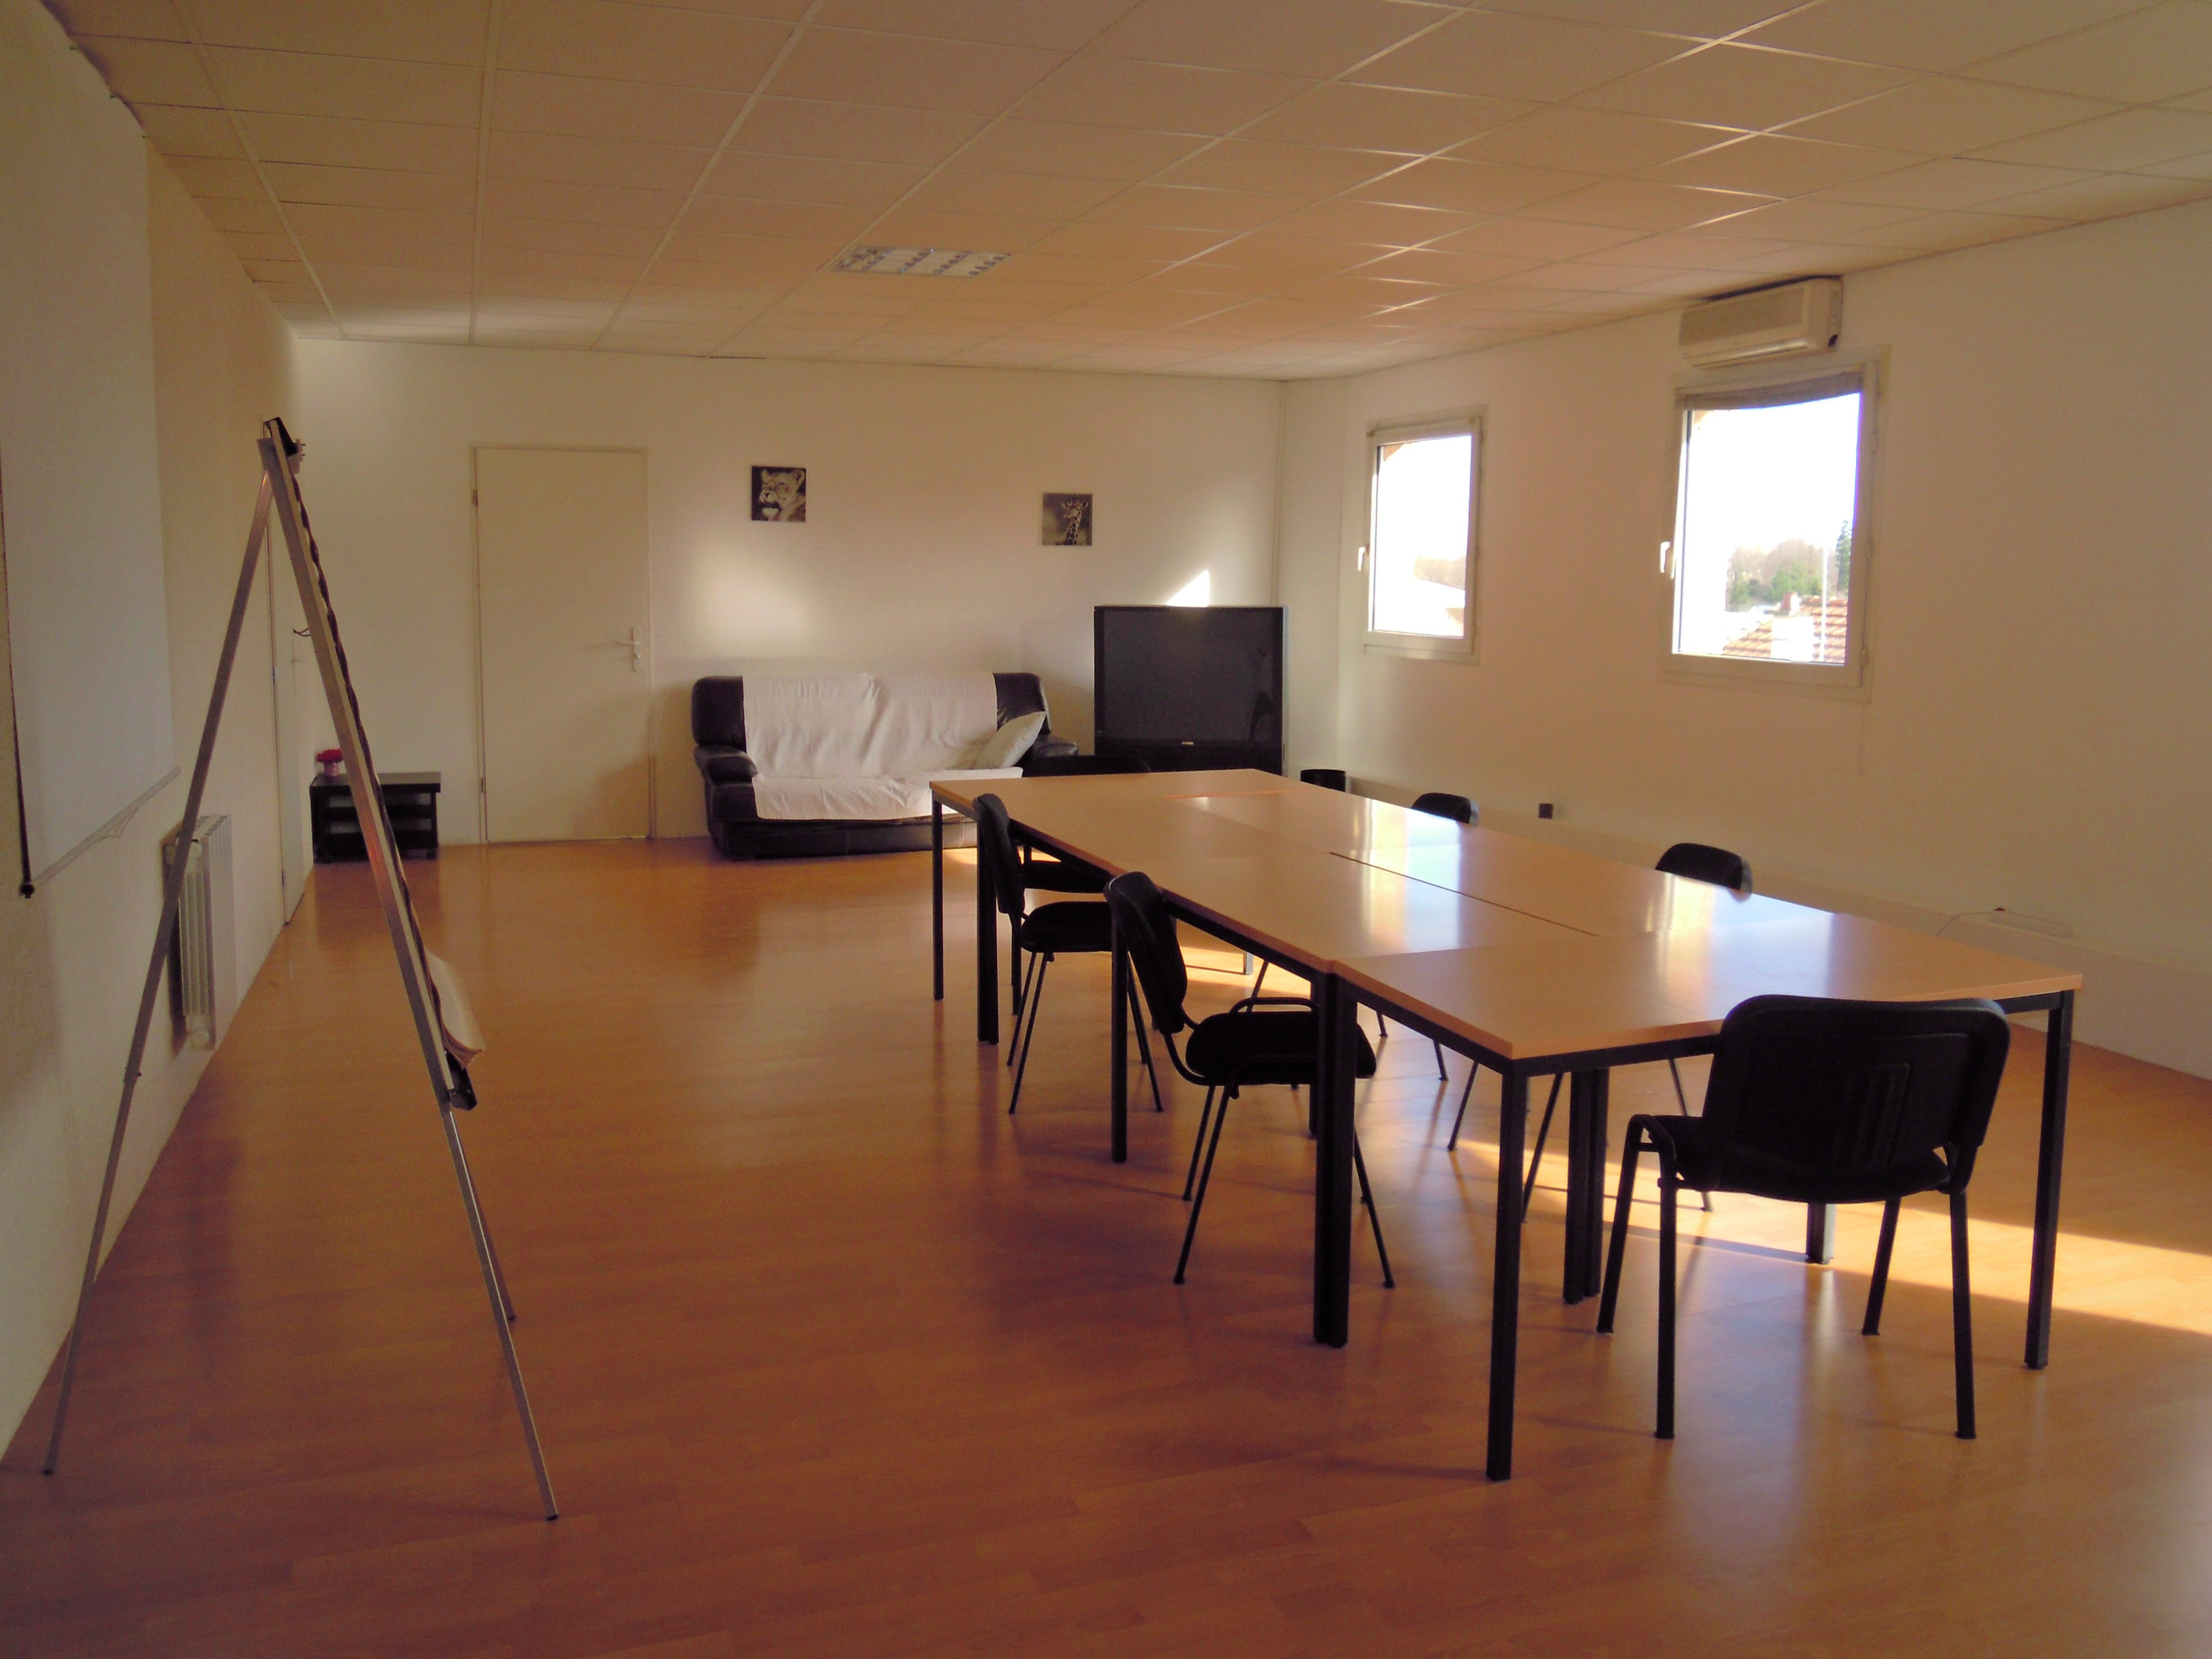 Salle Ikebana 2 modif - Location de salles de réunion